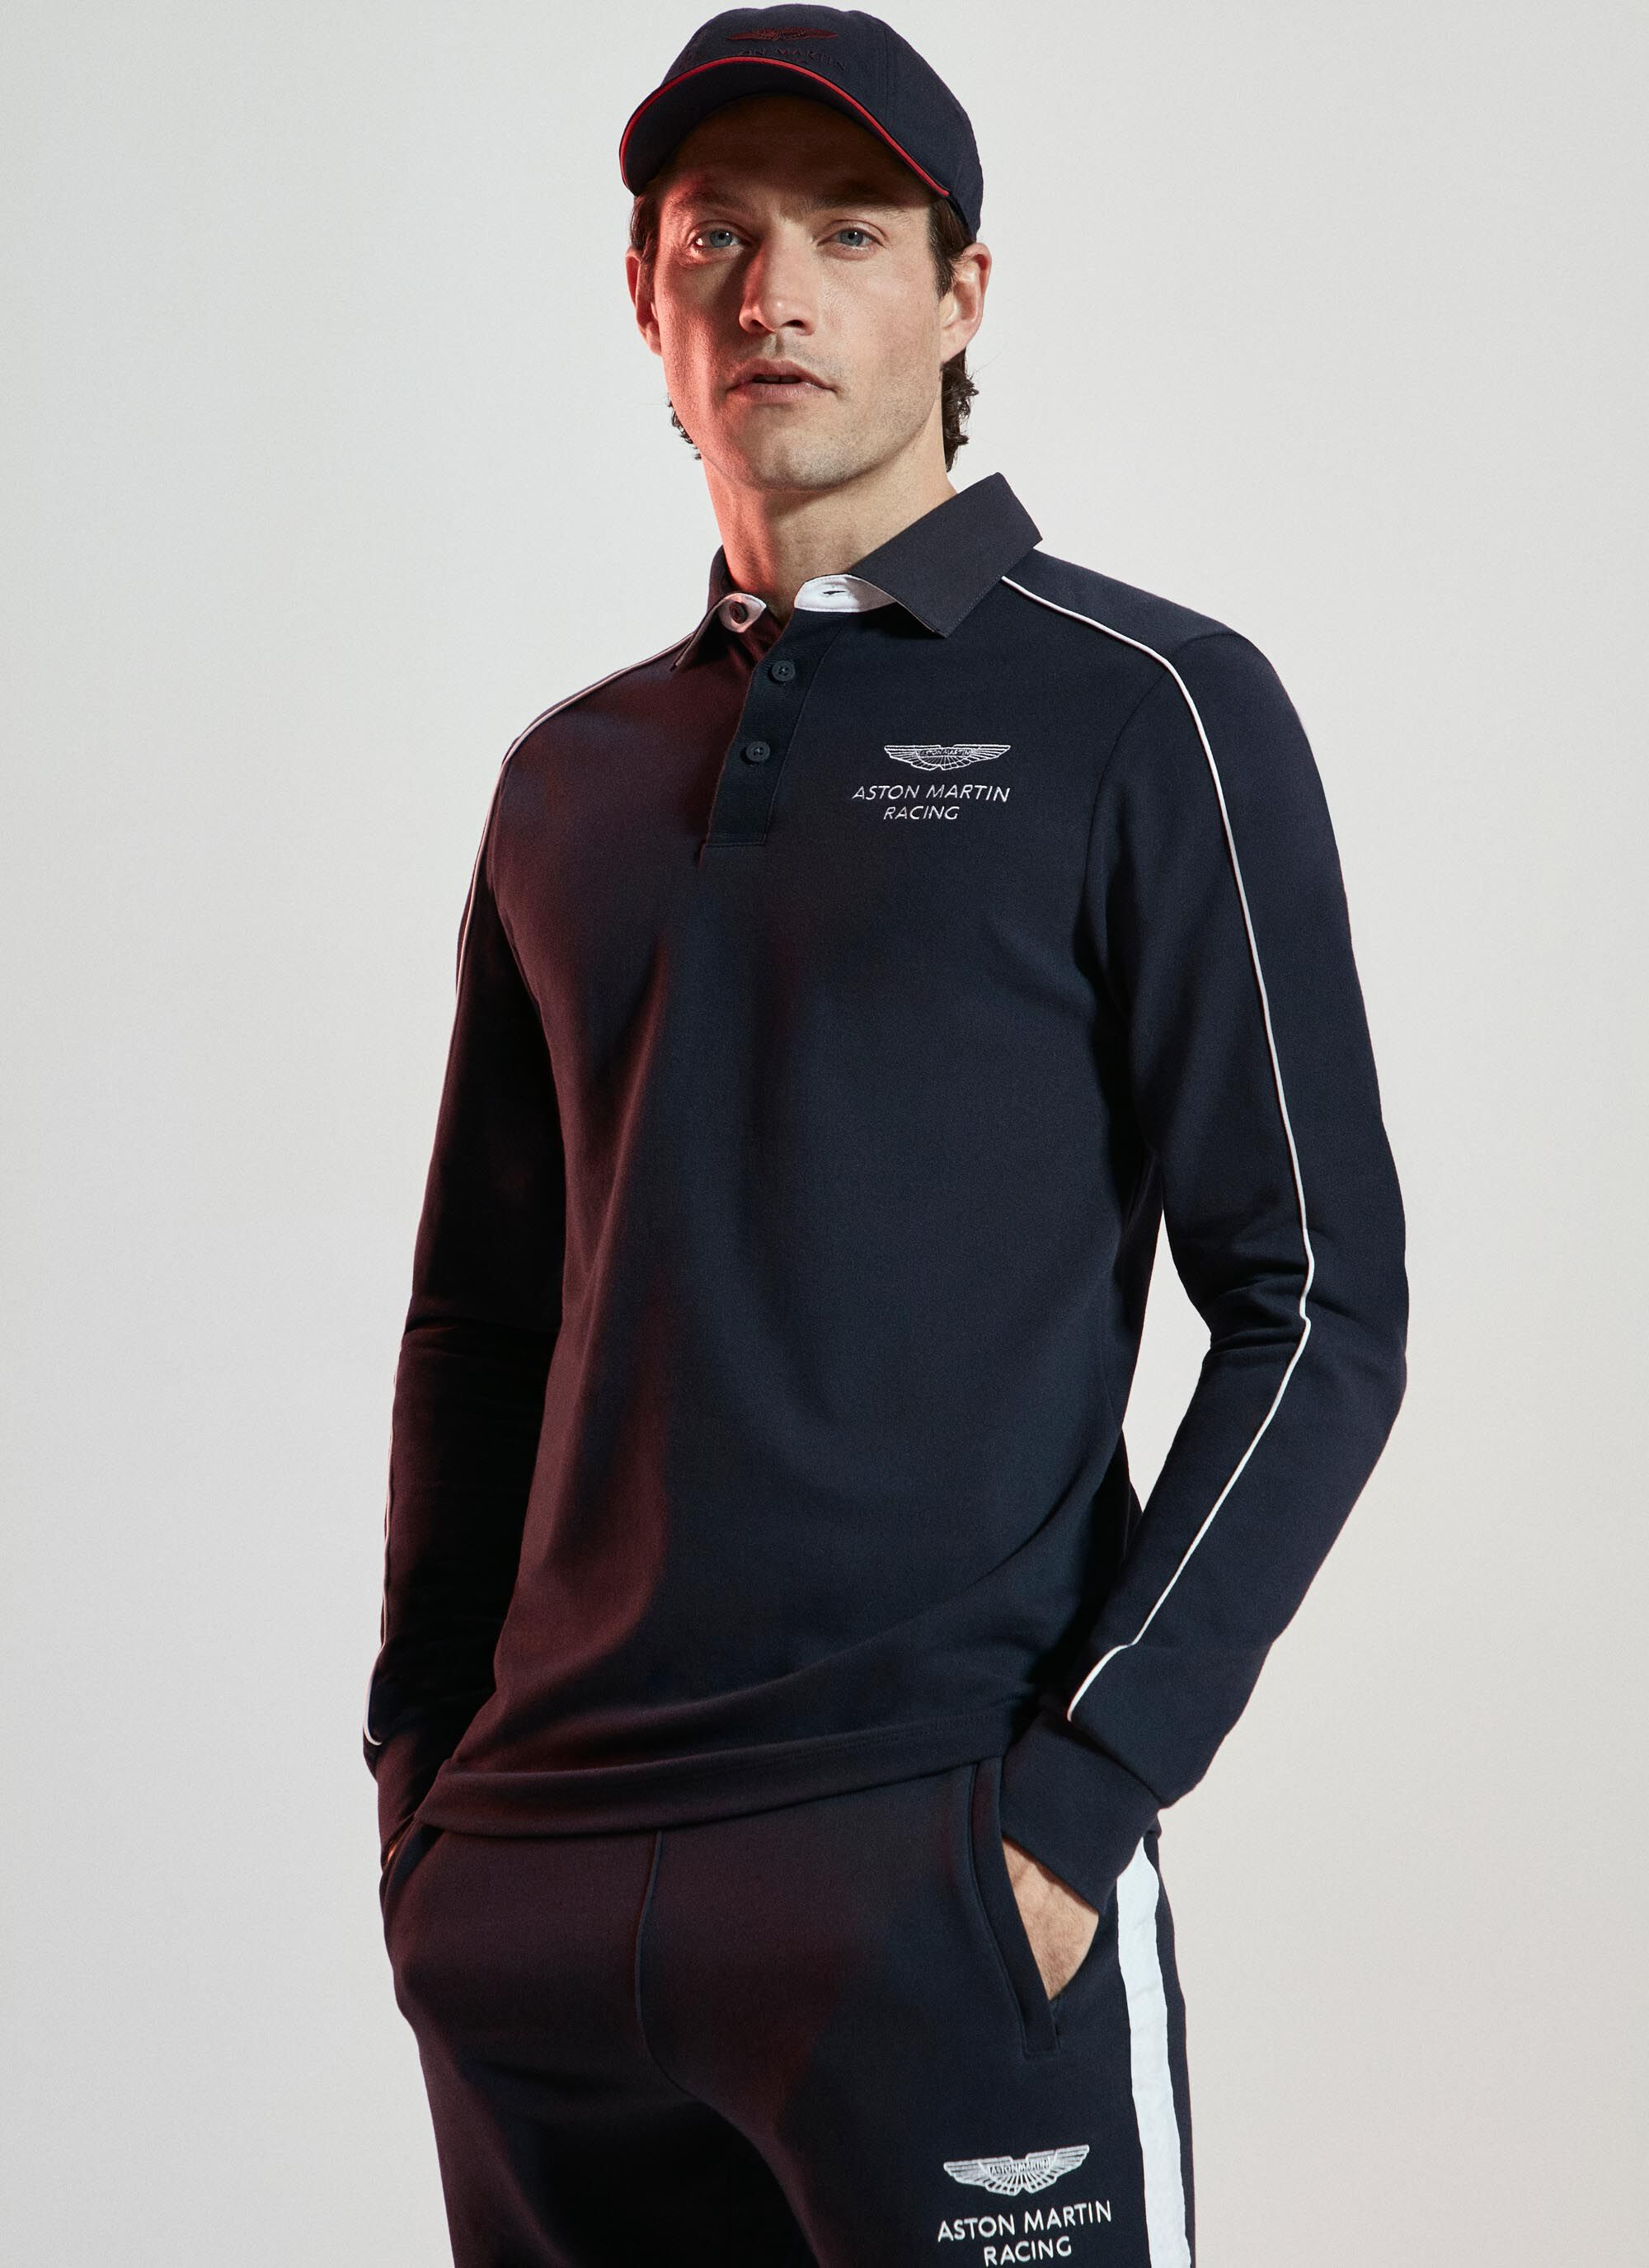 aston martin racing men's piped seam detail stretch cotton long-sleeved polo shirt | medium | navy